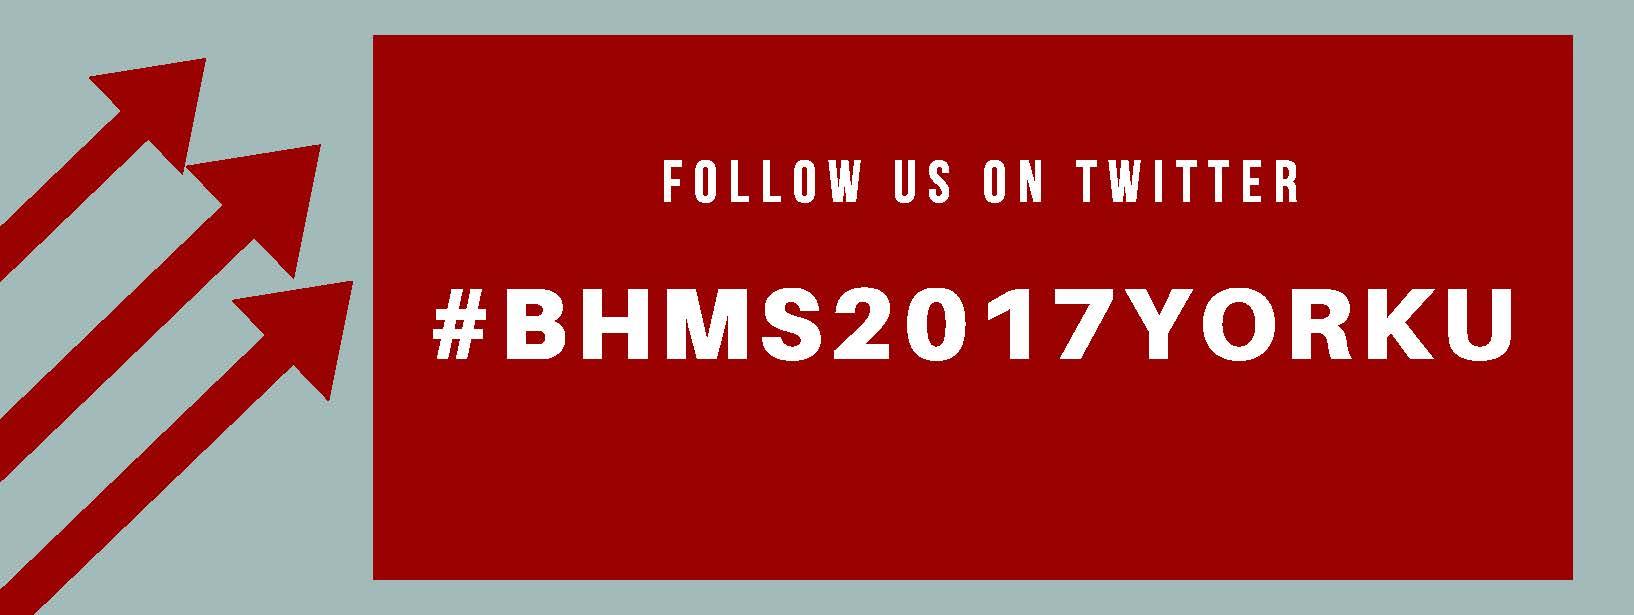 #BHMS2017 twitter